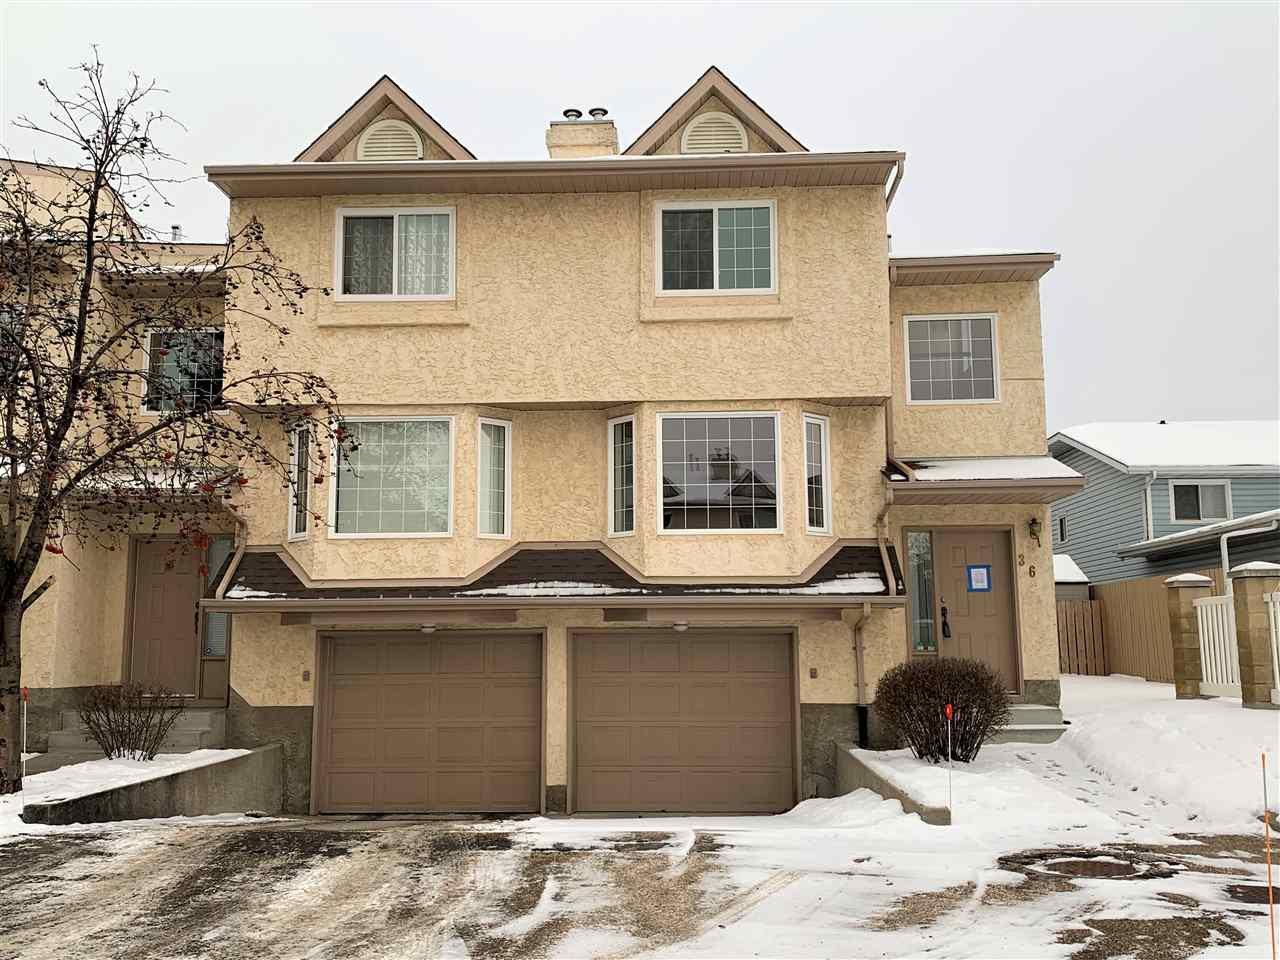 Main Photo: 36 3645 145 Avenue in Edmonton: Zone 35 Townhouse for sale : MLS®# E4184240